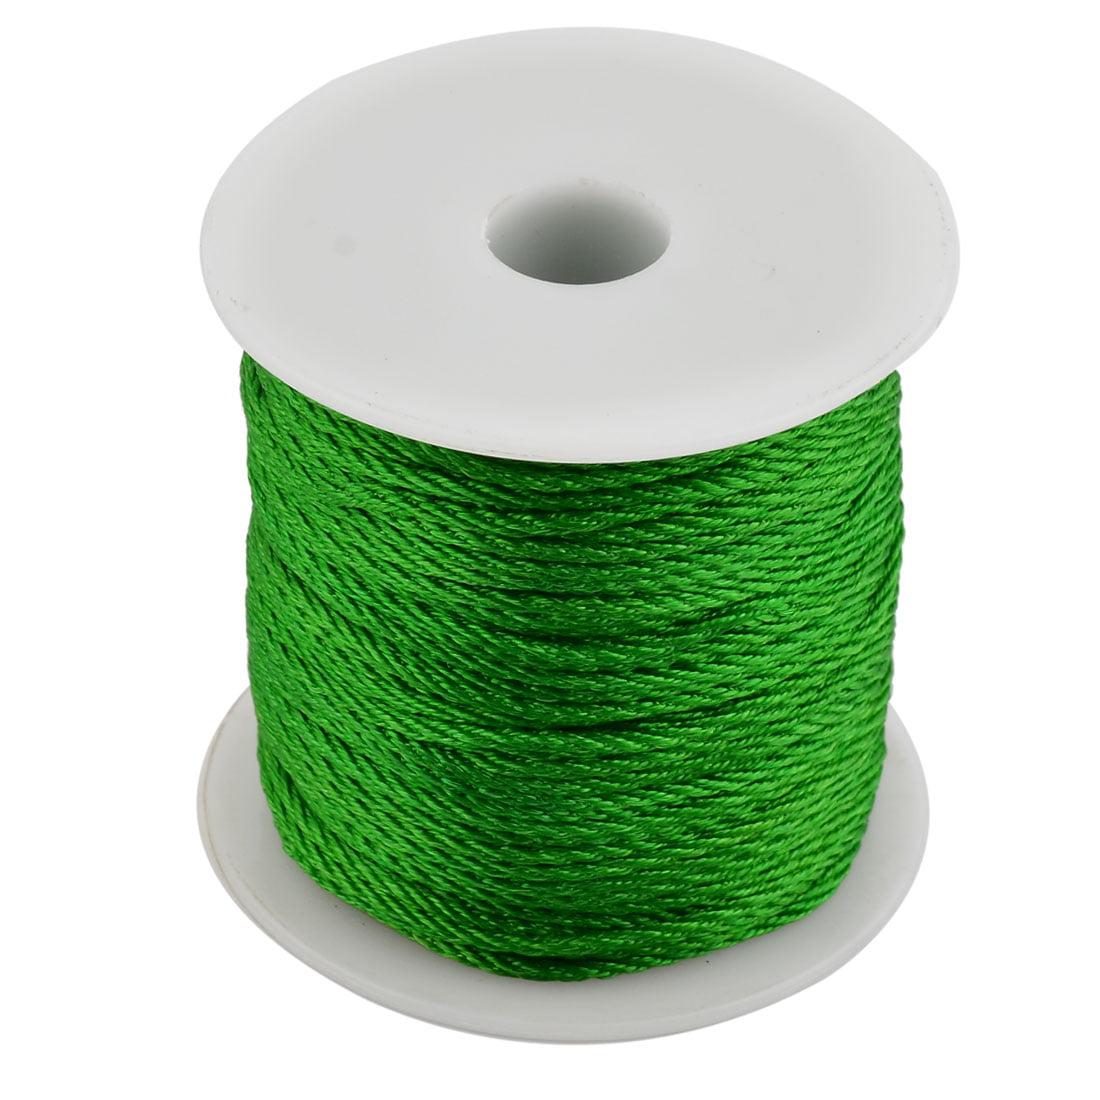 Household Nylon Handicraft Chinese Knot Bracelet Cord Thread Green 55 Yards